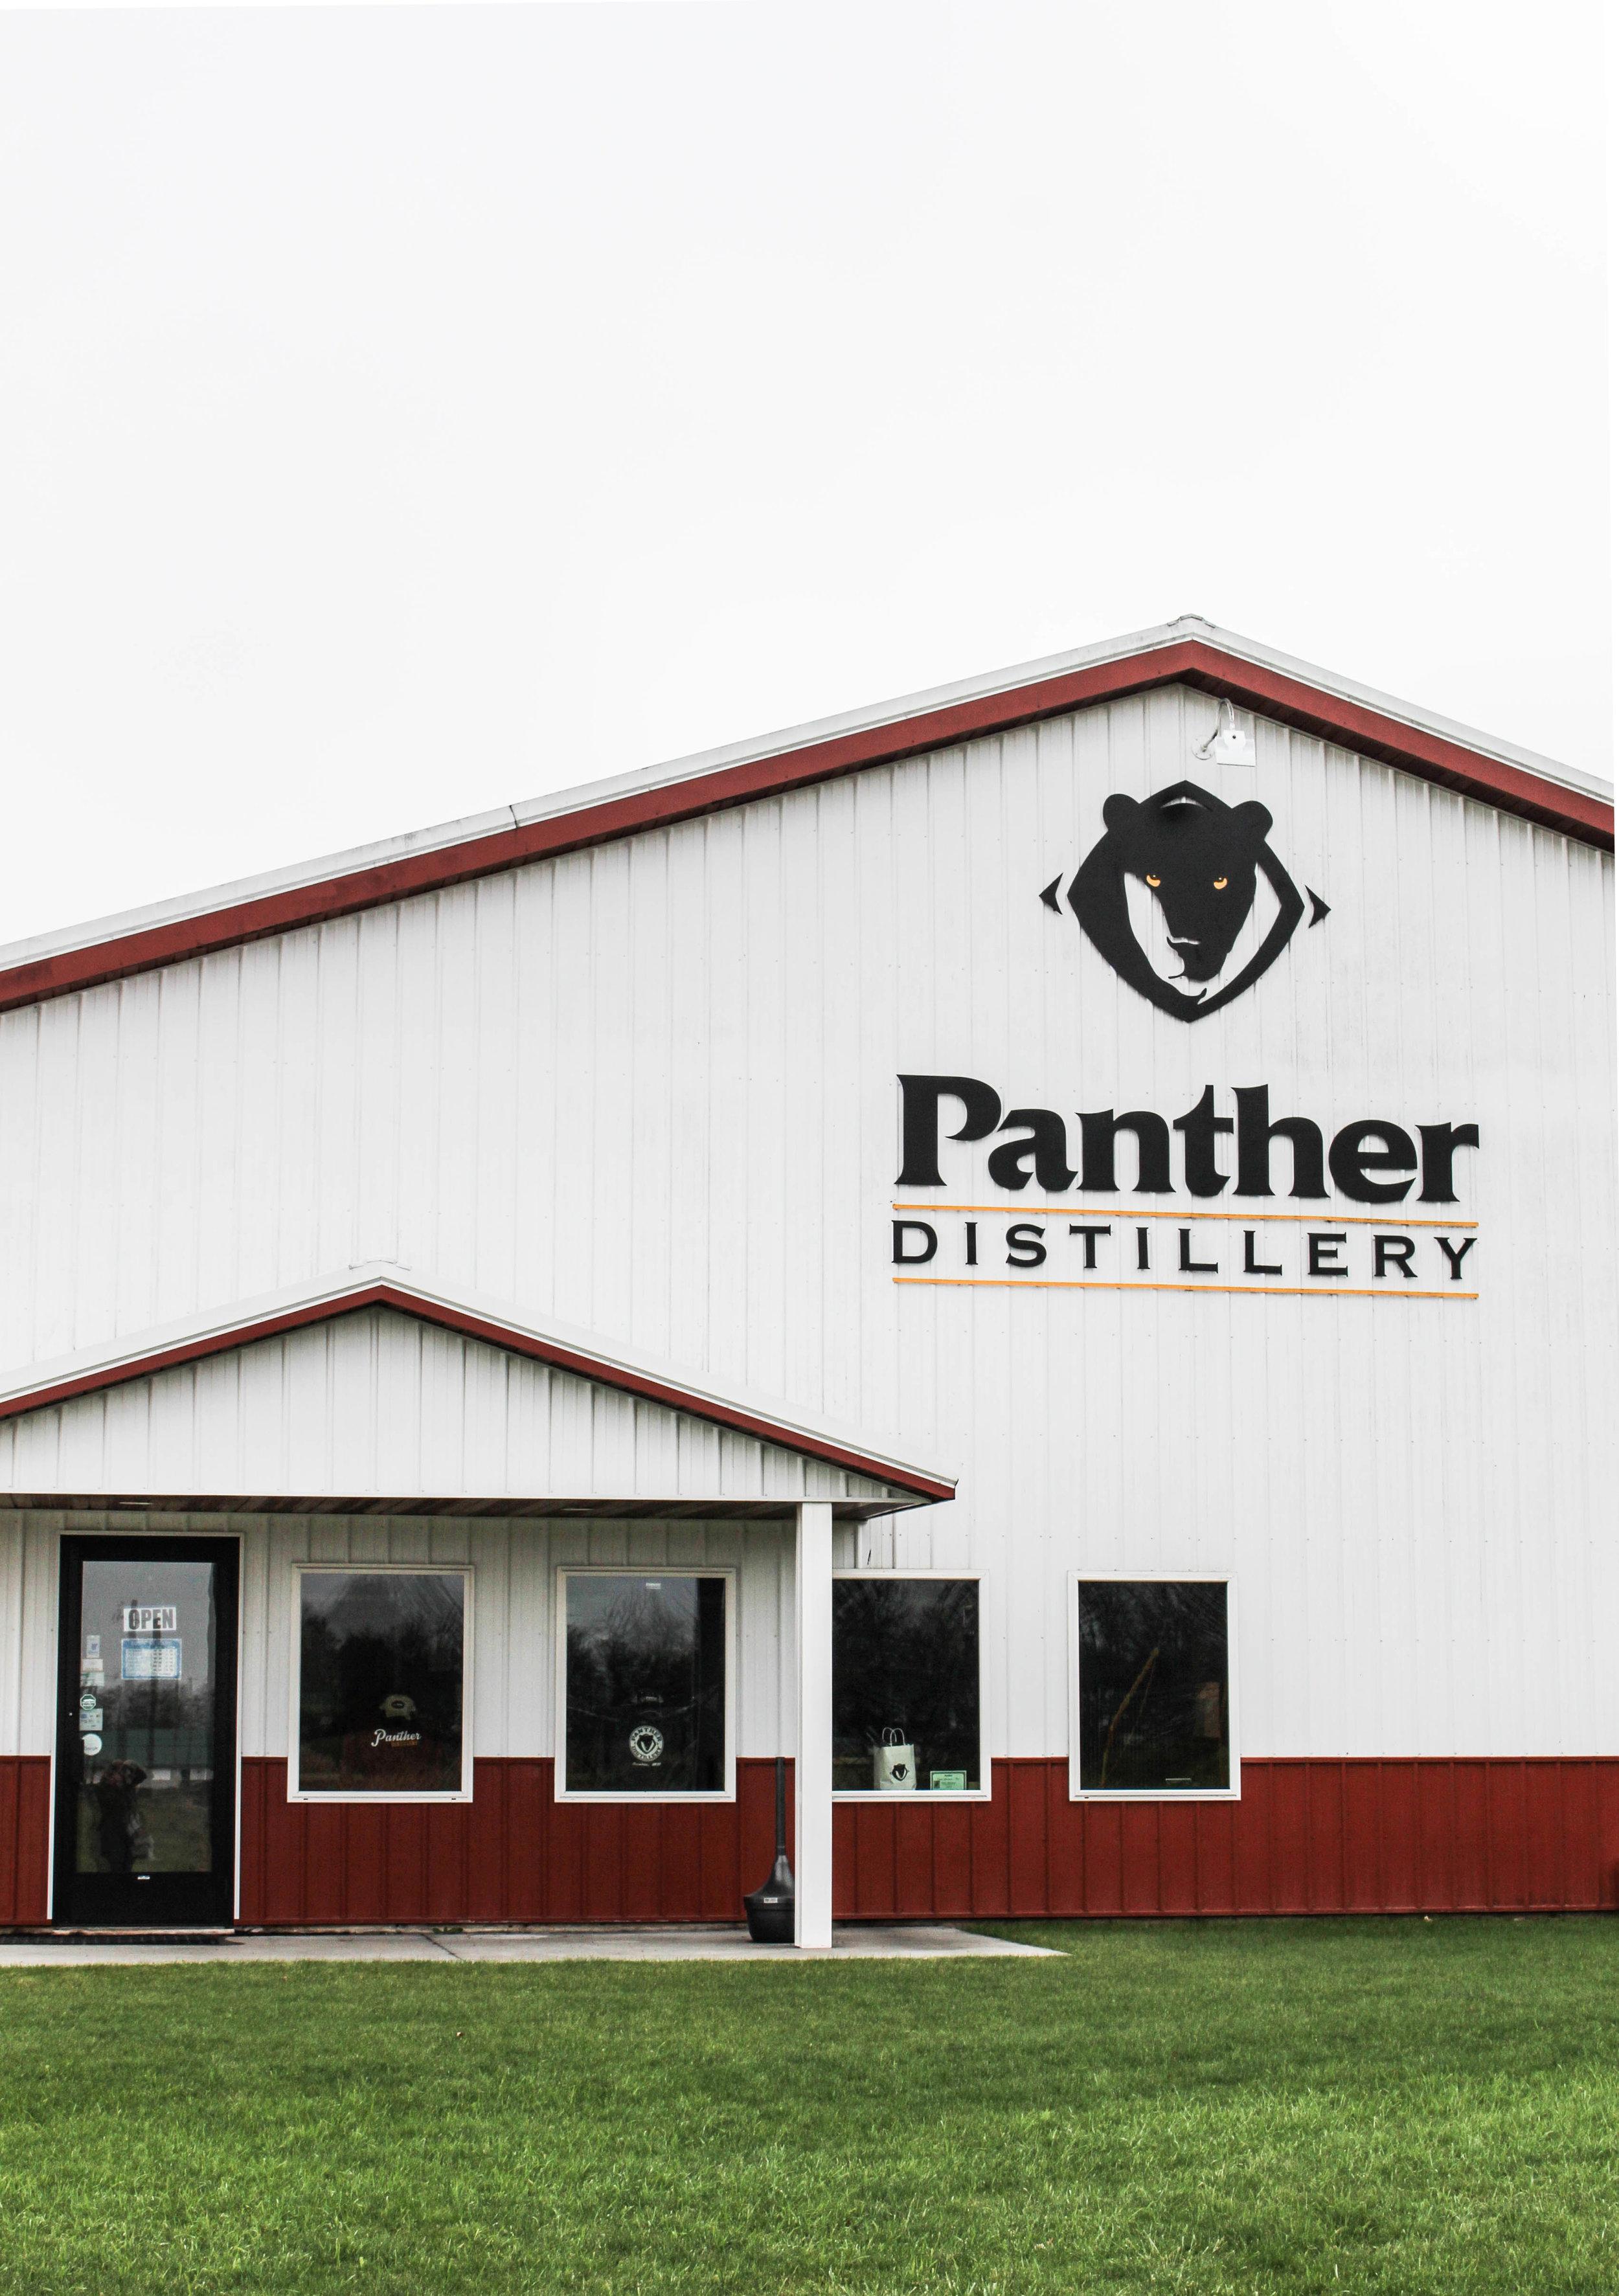 Panther Distillery_Building.jpg.jpeg